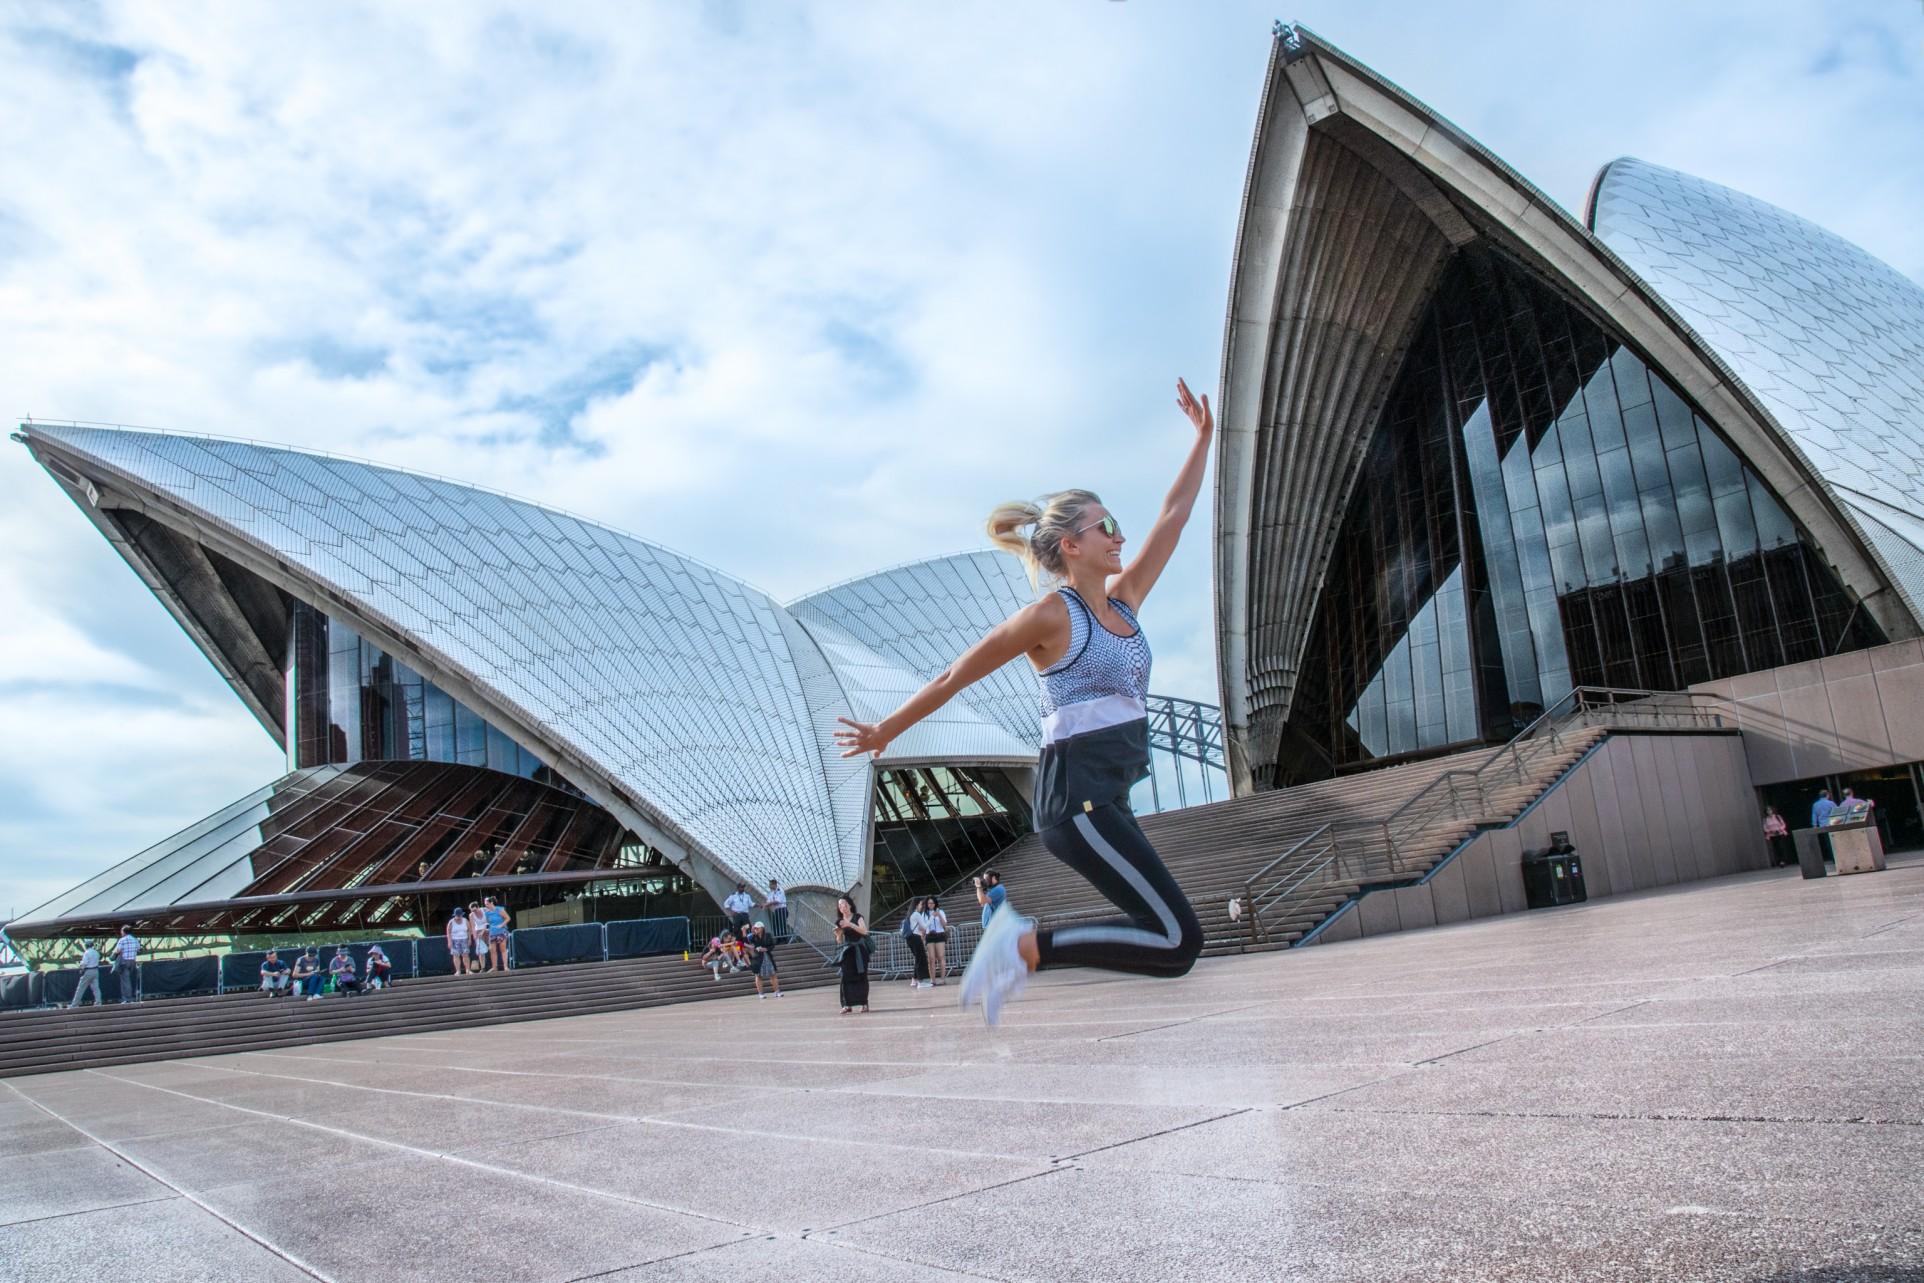 Fitness On Toast - Sydney Trip Faya Blog Girl Healthy Workout Travel Inspiration Australia Luxury Escape Wellness Wellbeing-46